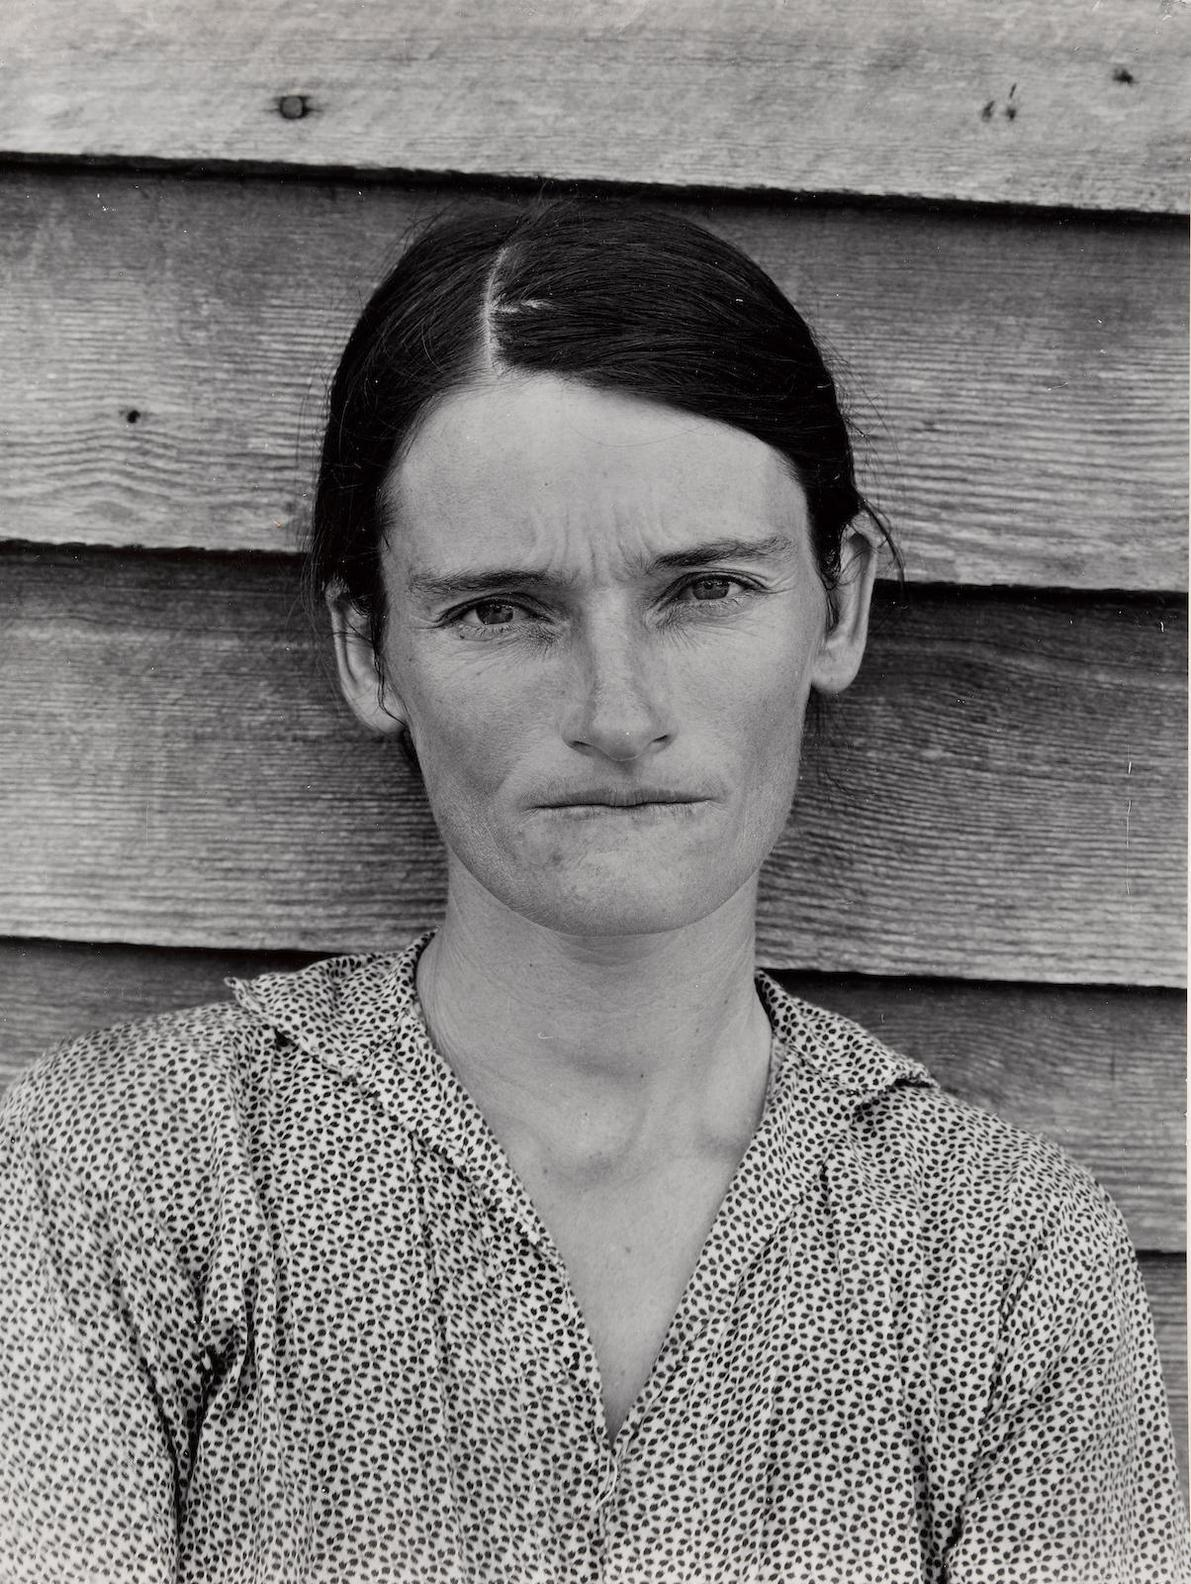 Walker Evans-Alabama Cotton Tenant Farmers Wife (Allie Mae Burroughs)-1936